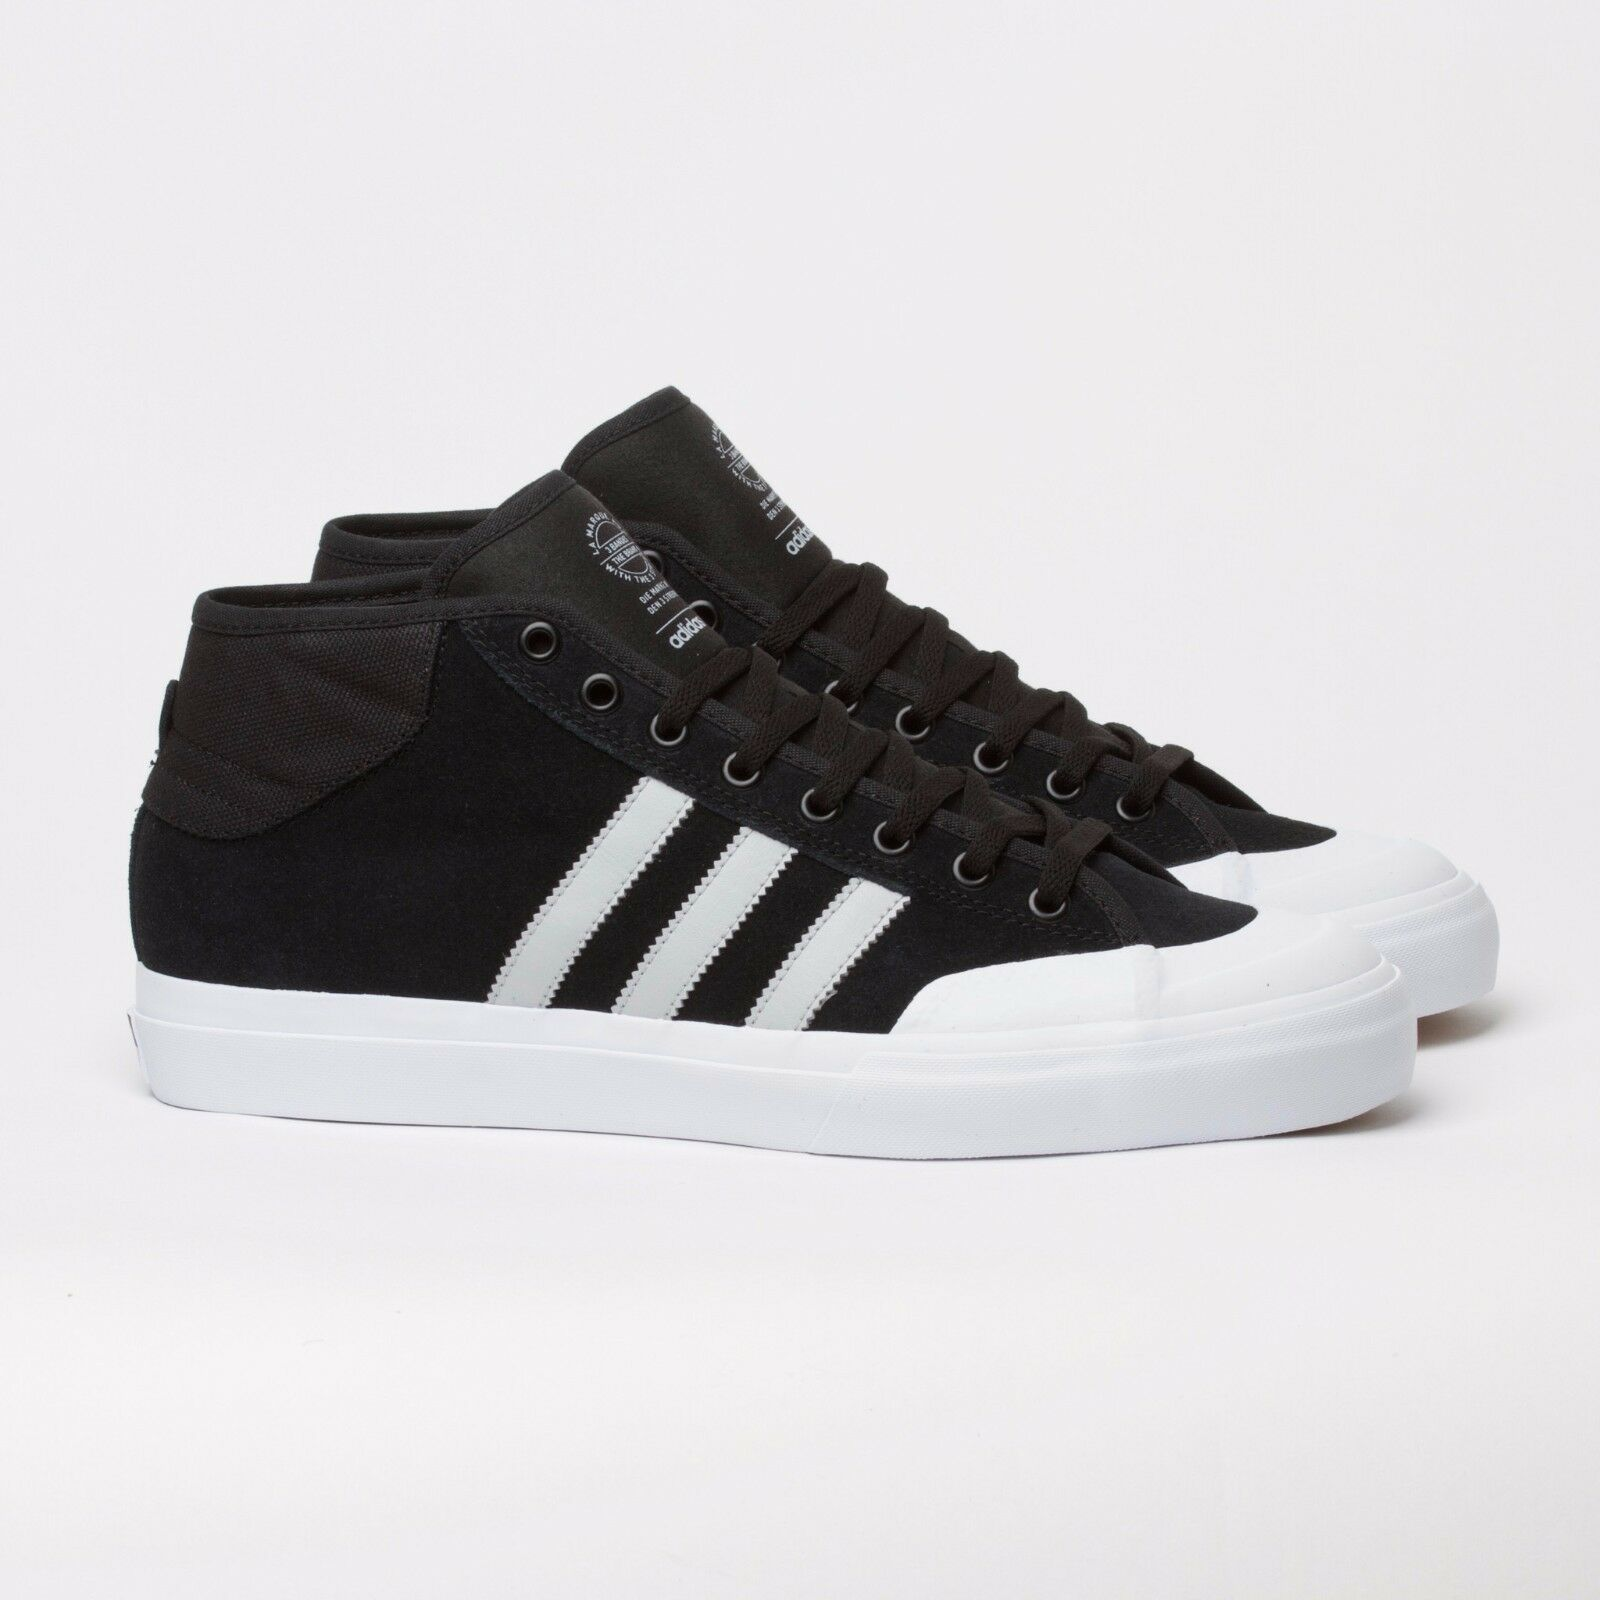 [Adidas Original] Matchcourt MID ADV Black B27334 Sneakers Skateboard Shoes Black ADV cc4250